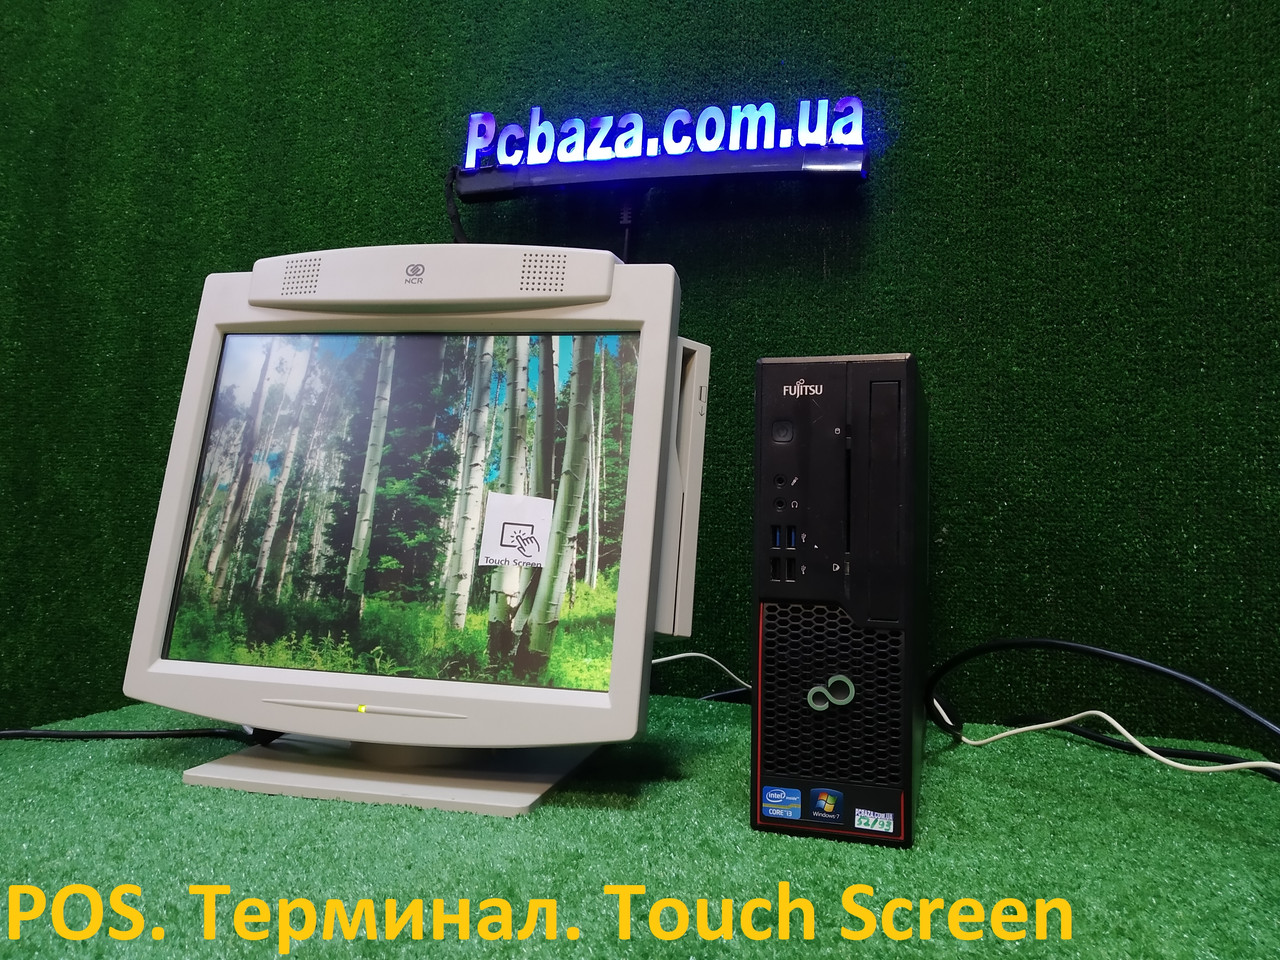 "POS Торговый терминал Fujitsu C710\ Core i3\ 4gb\ 2xCOM\10 USB\ + 15"" NCR Touchscreen"